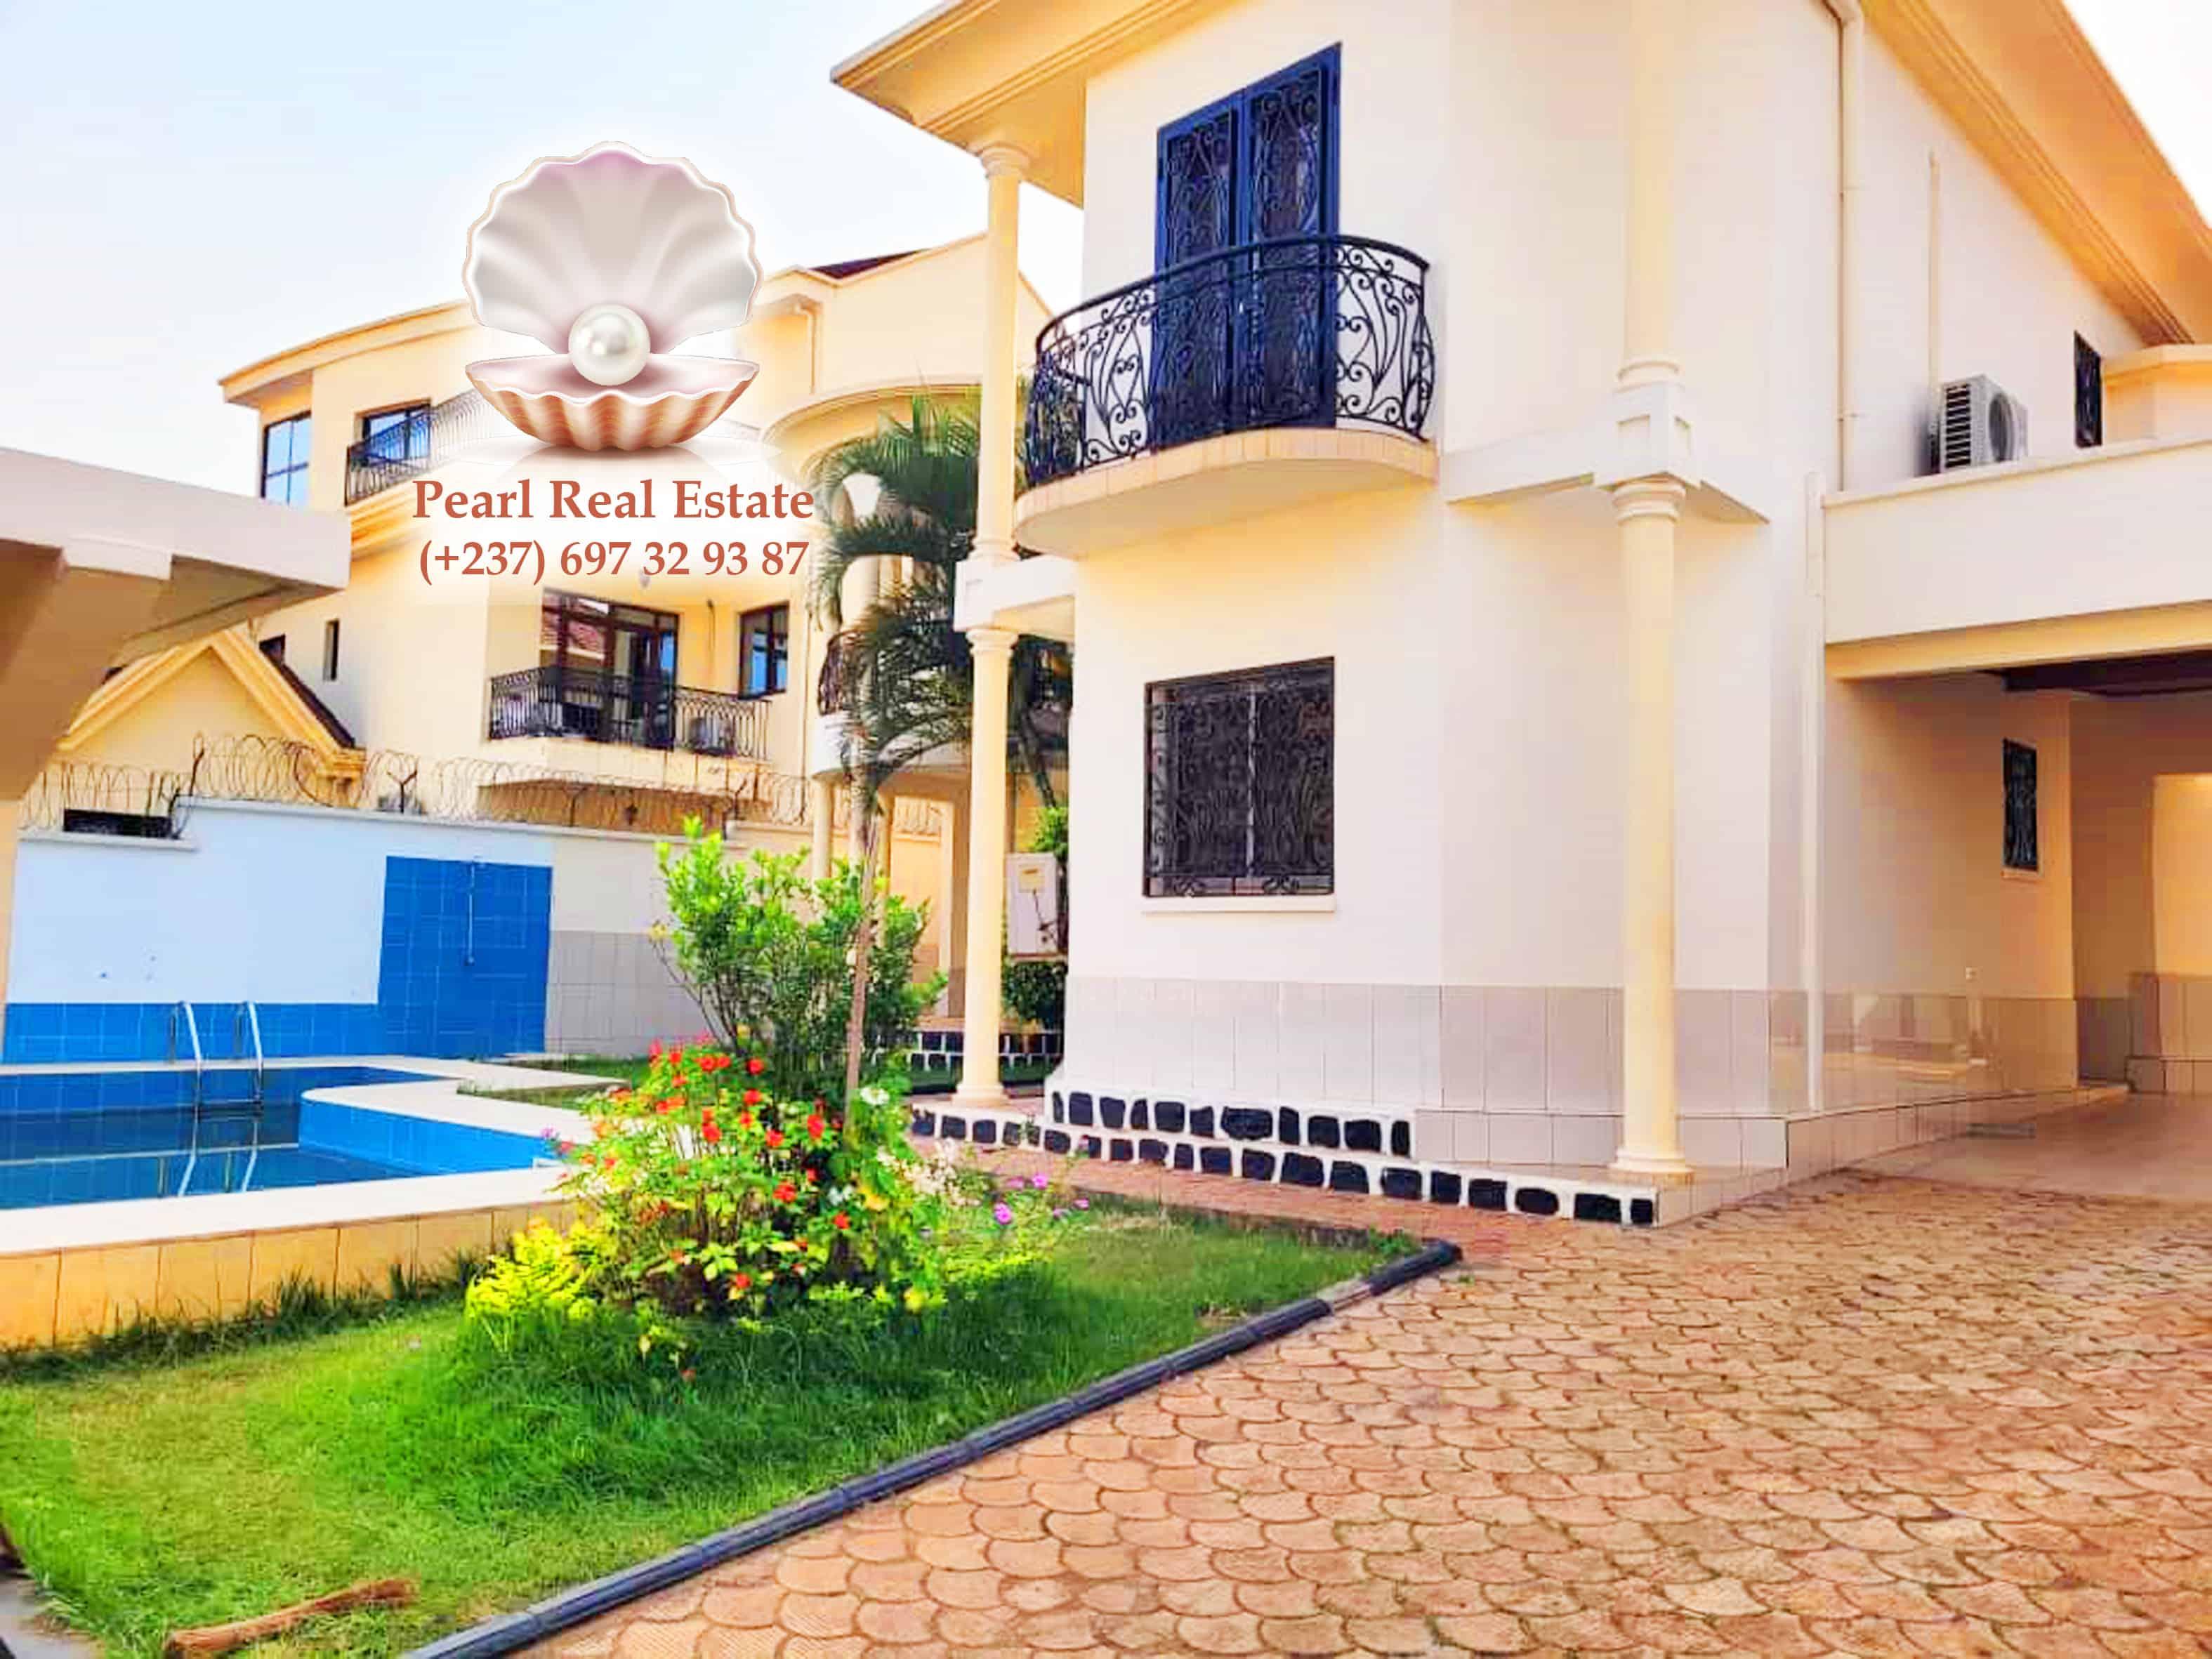 House (Villa) to rent - Yaoundé, Bastos, Bastos - 1 living room(s), 4 bedroom(s), 3 bathroom(s) - 2 500 000 FCFA / month